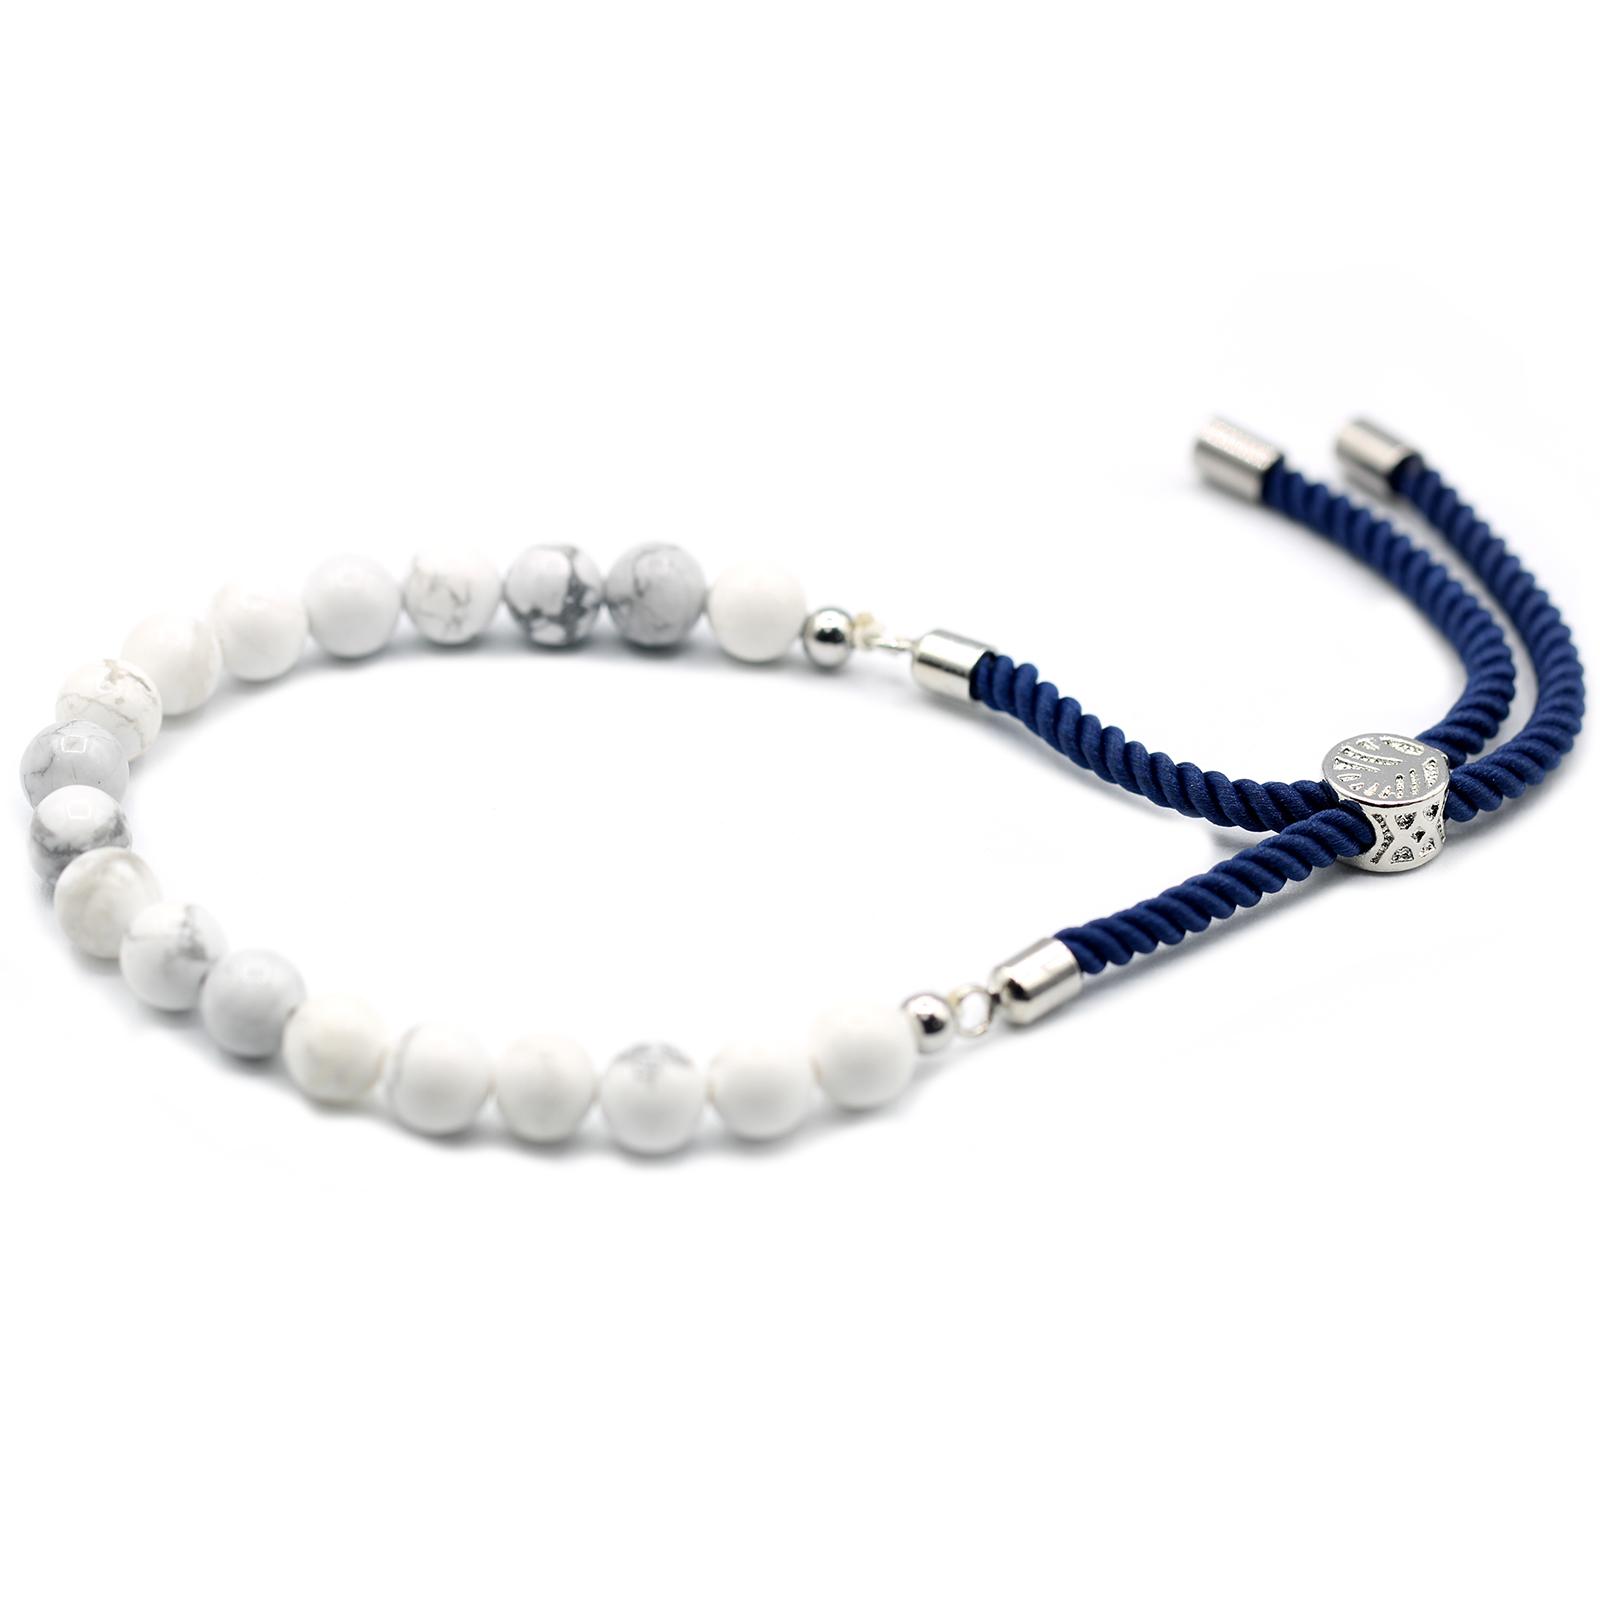 925 Silver Plated Gemstone Navy String Bracelet White Howlite